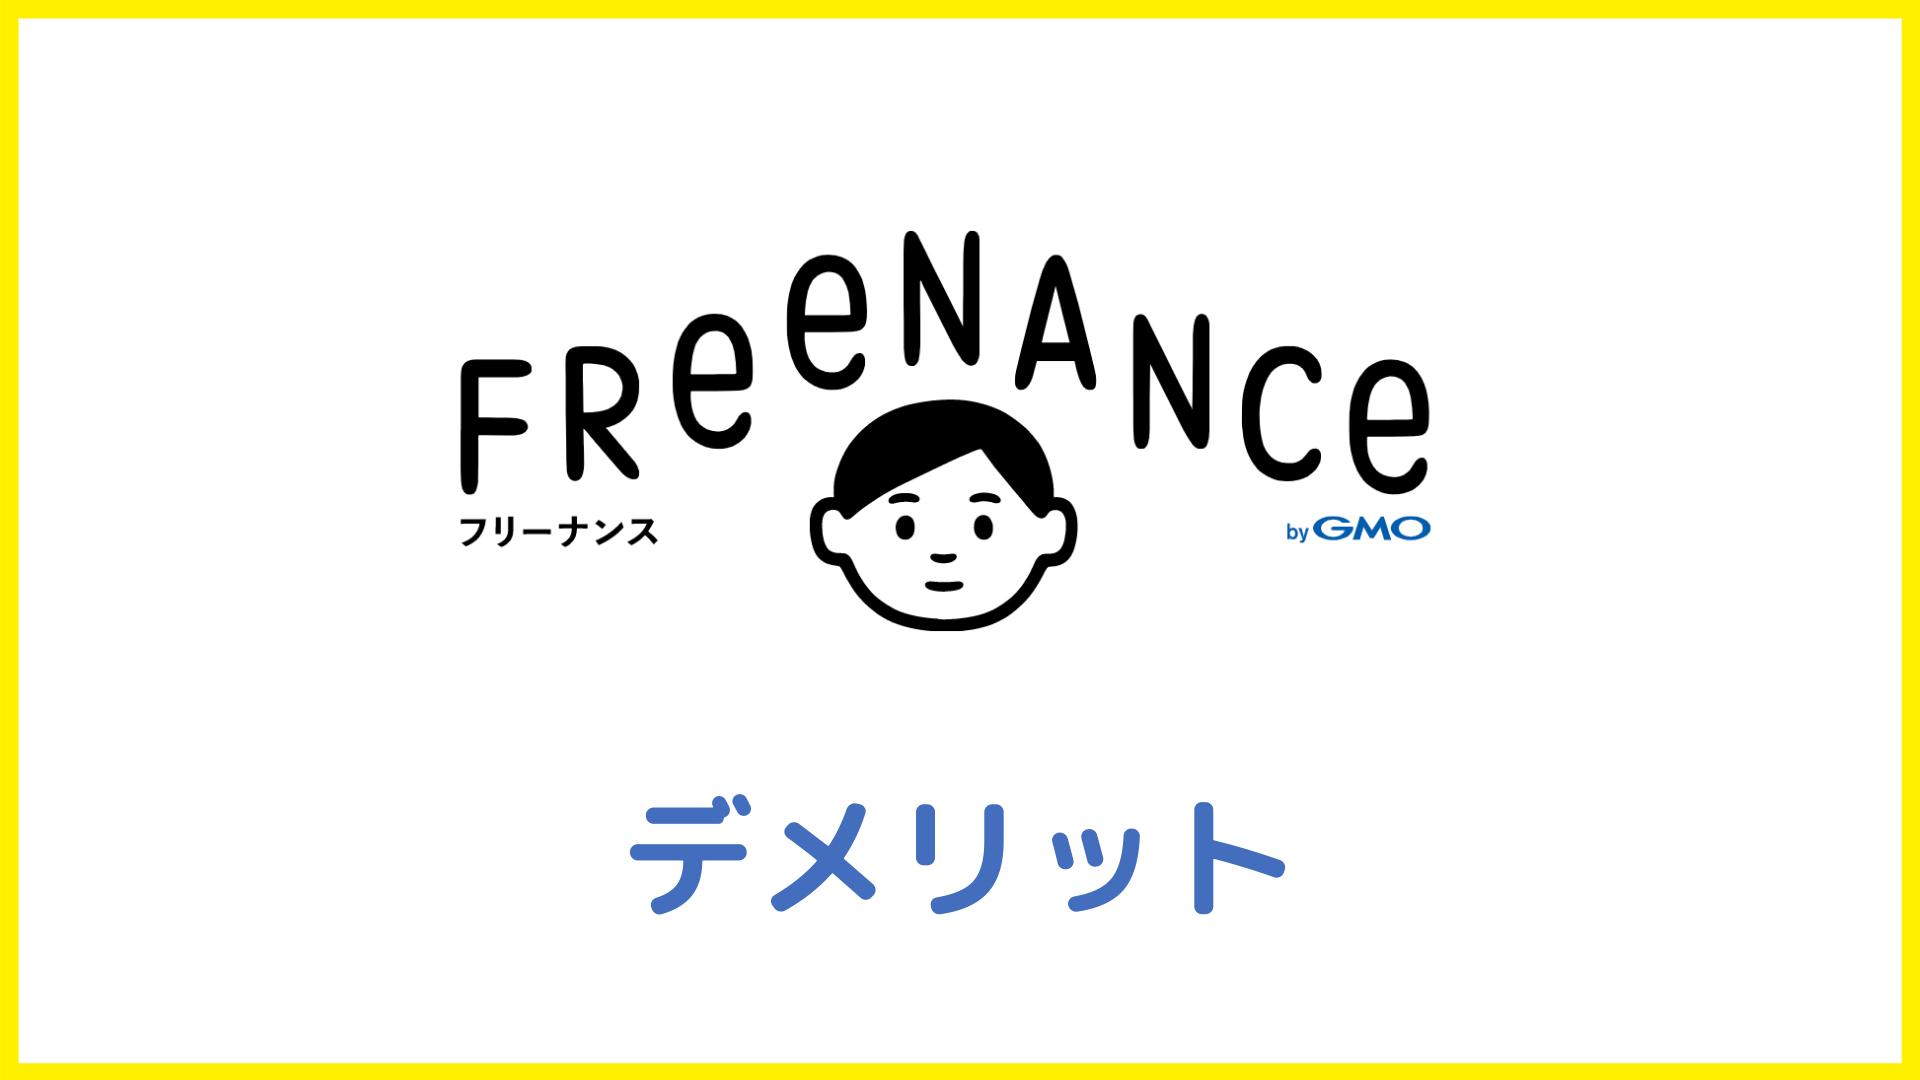 FREENANCE(フリーナンス)のデメリット2つ